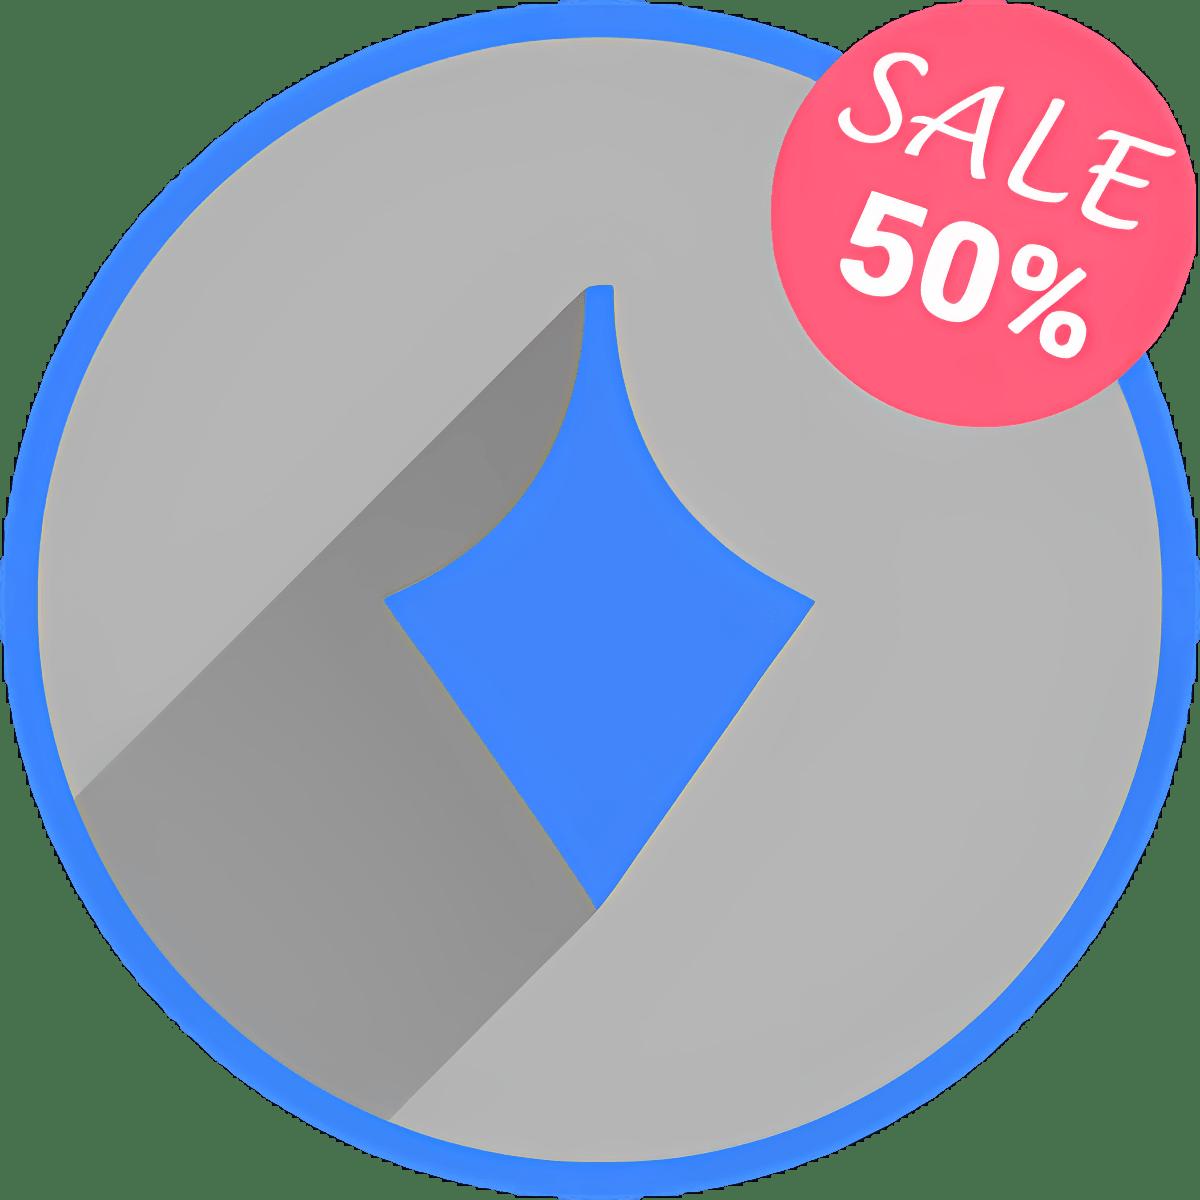 Velur - Icon Pack 15.0.0